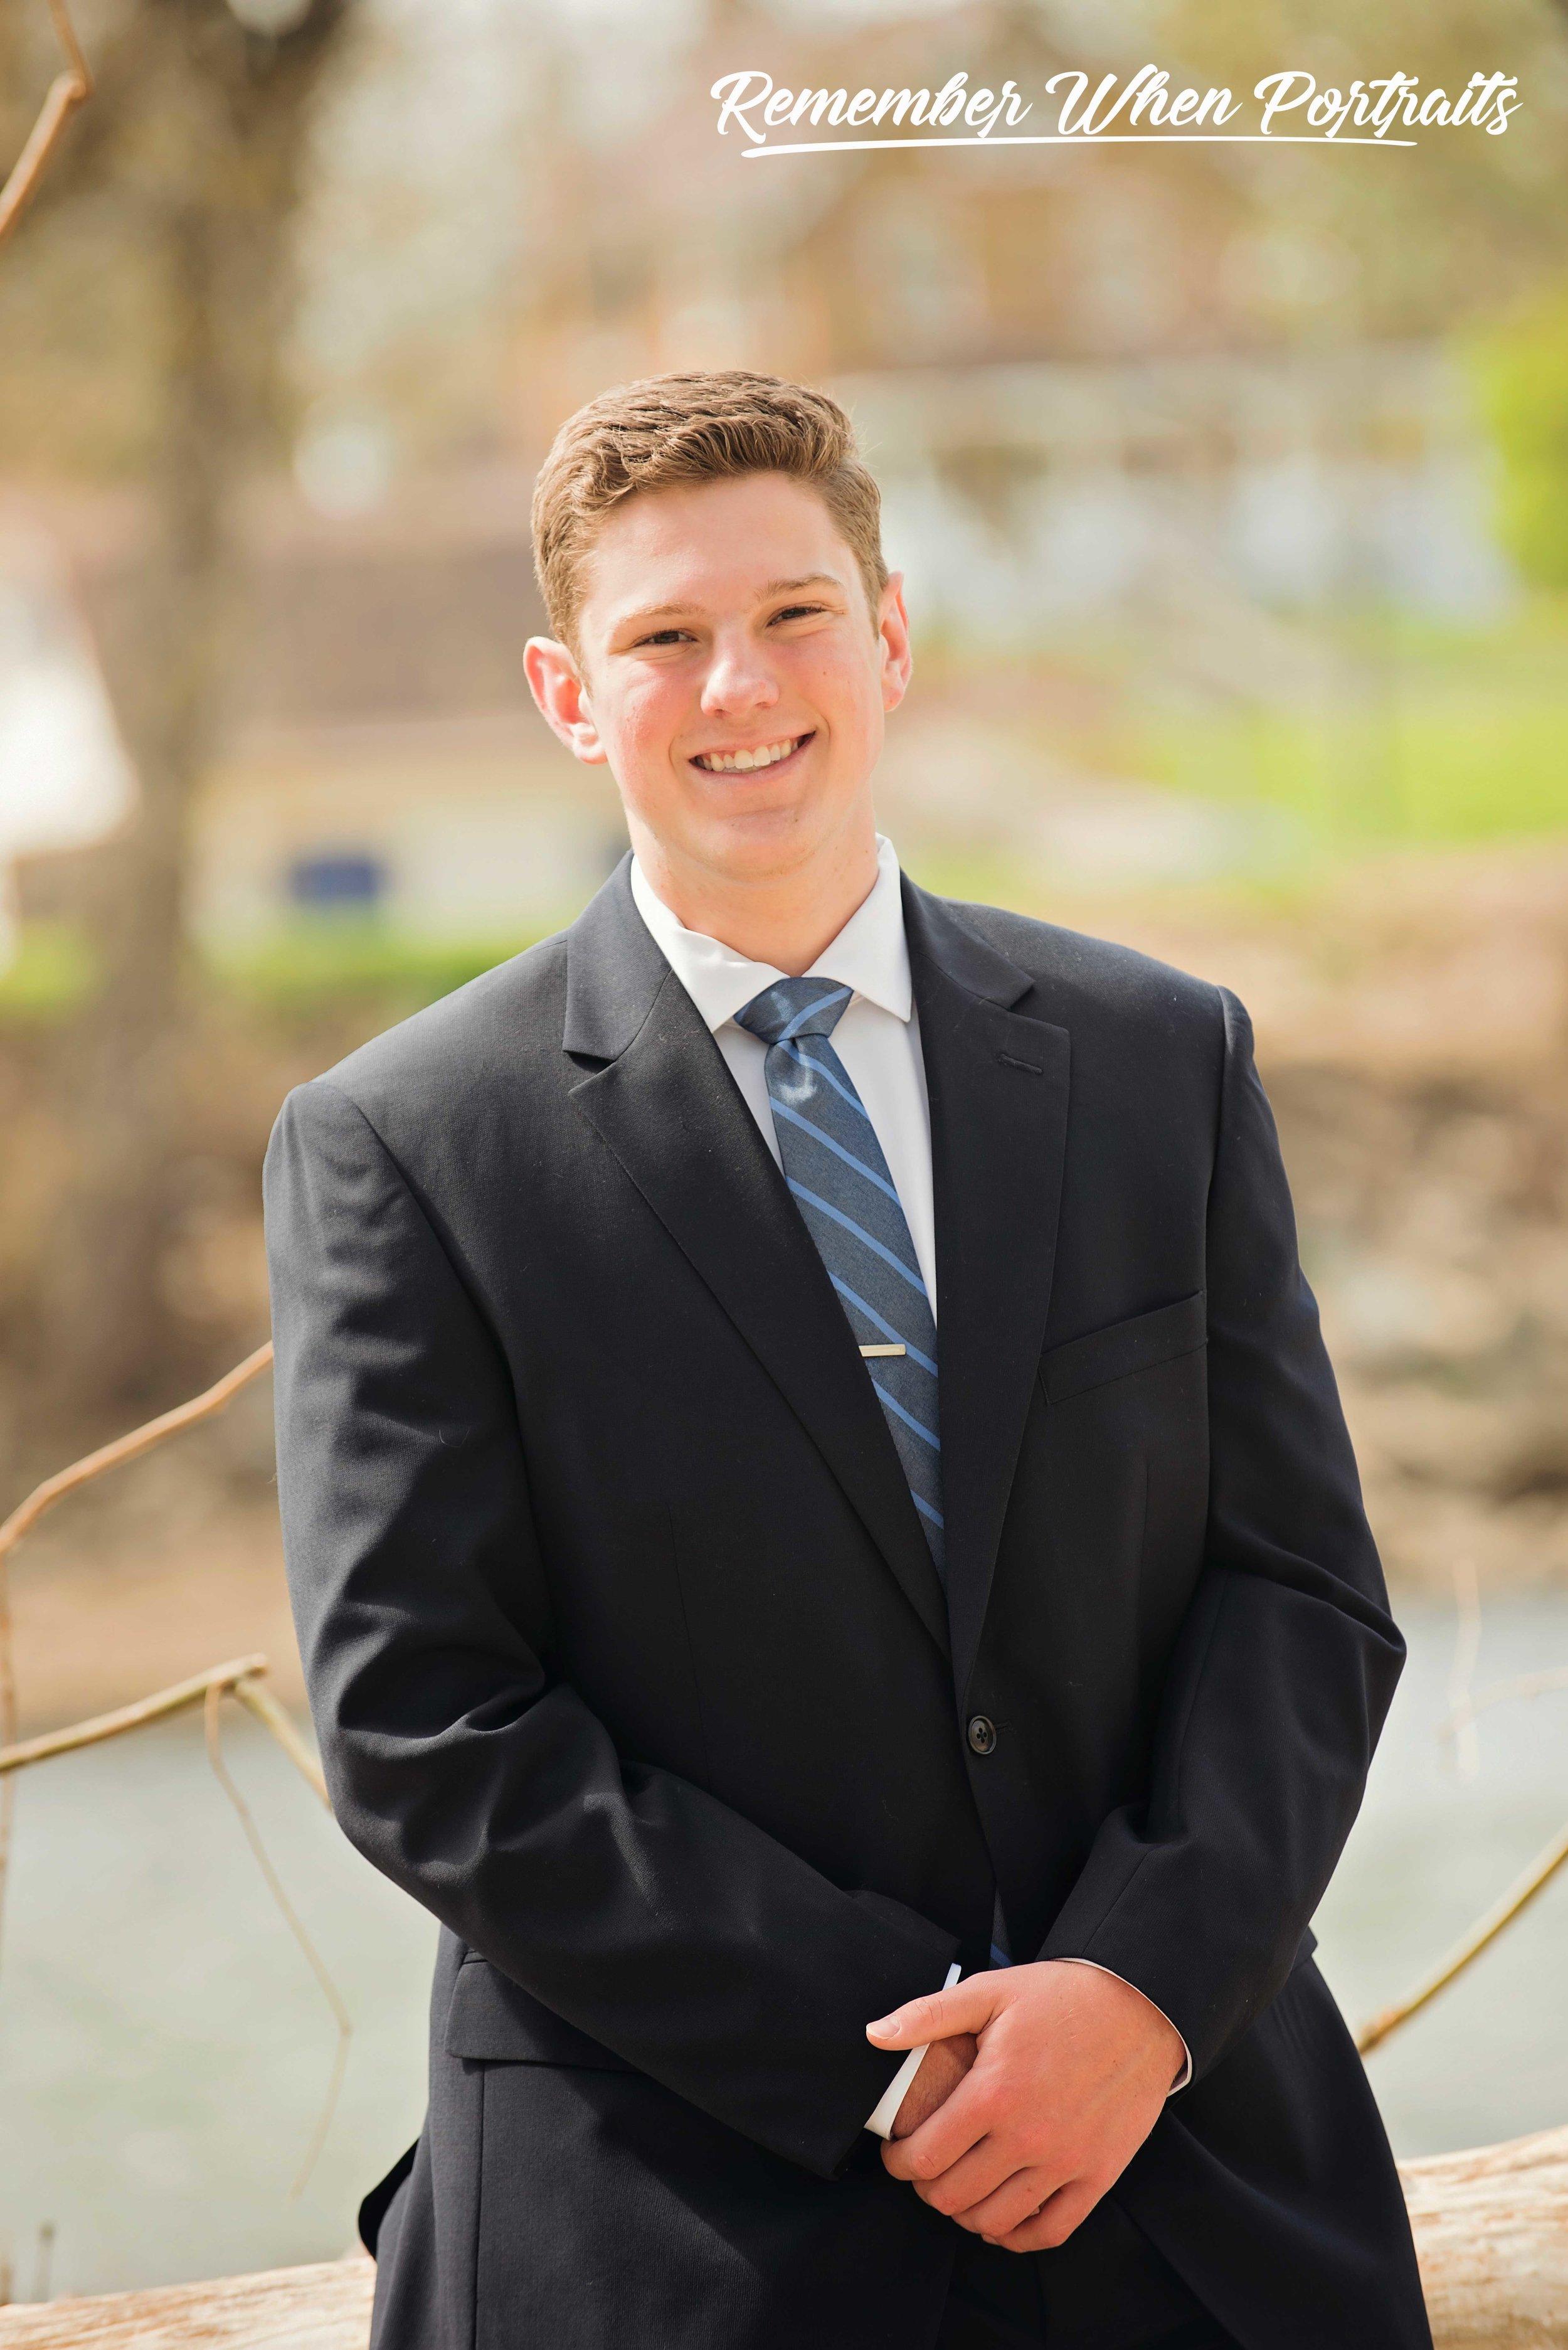 Ryan Highfield, Class of 202, Little Miami High School, Remember When Portraits Cincinnati Senior Photographer